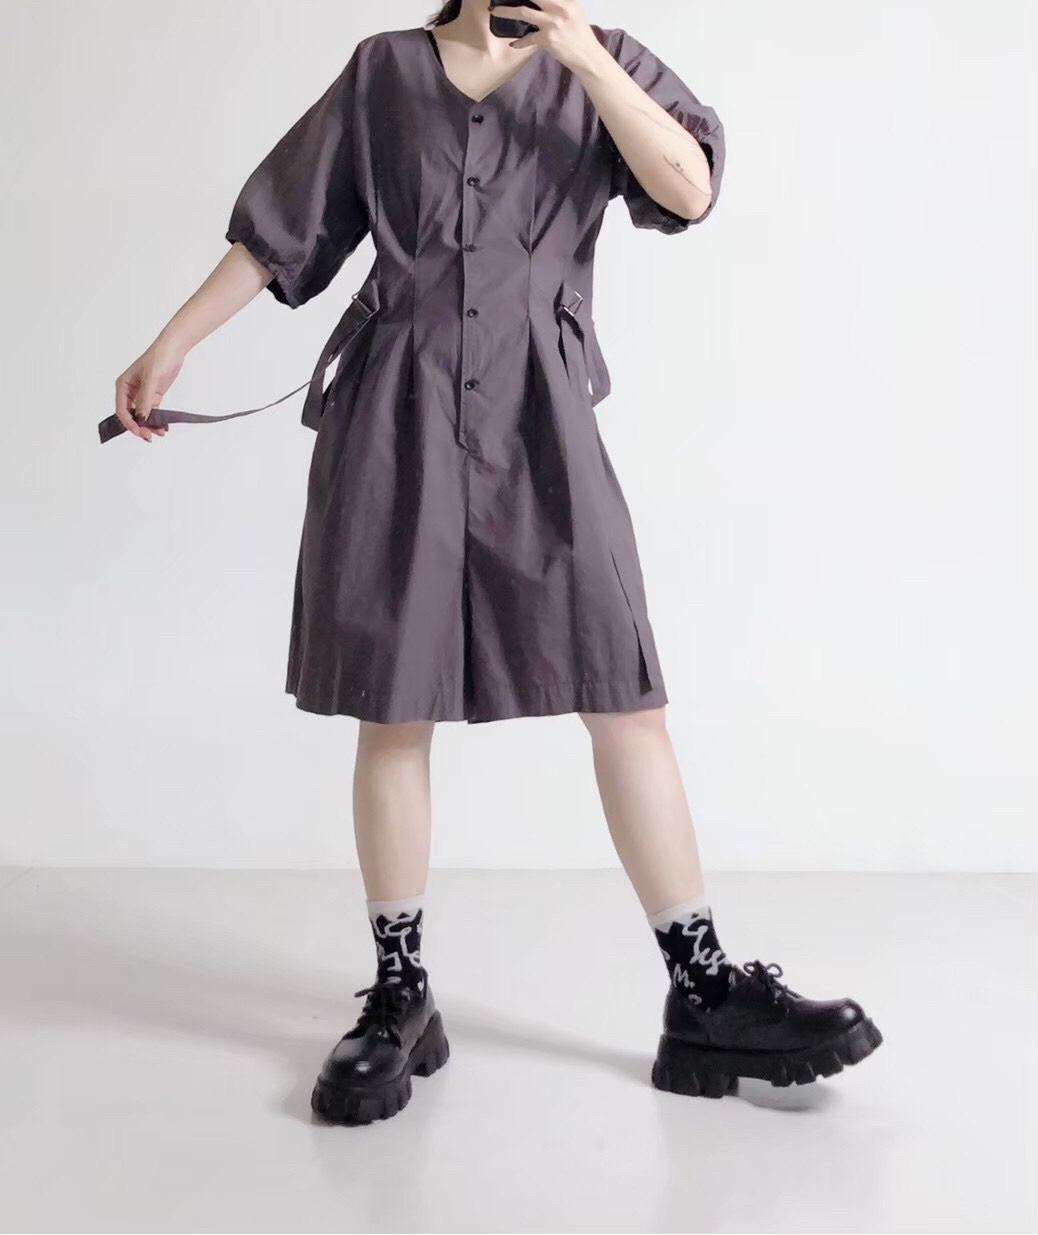 Chemistry_Girls - 韓國 五分寬褲連身裝 (二色)